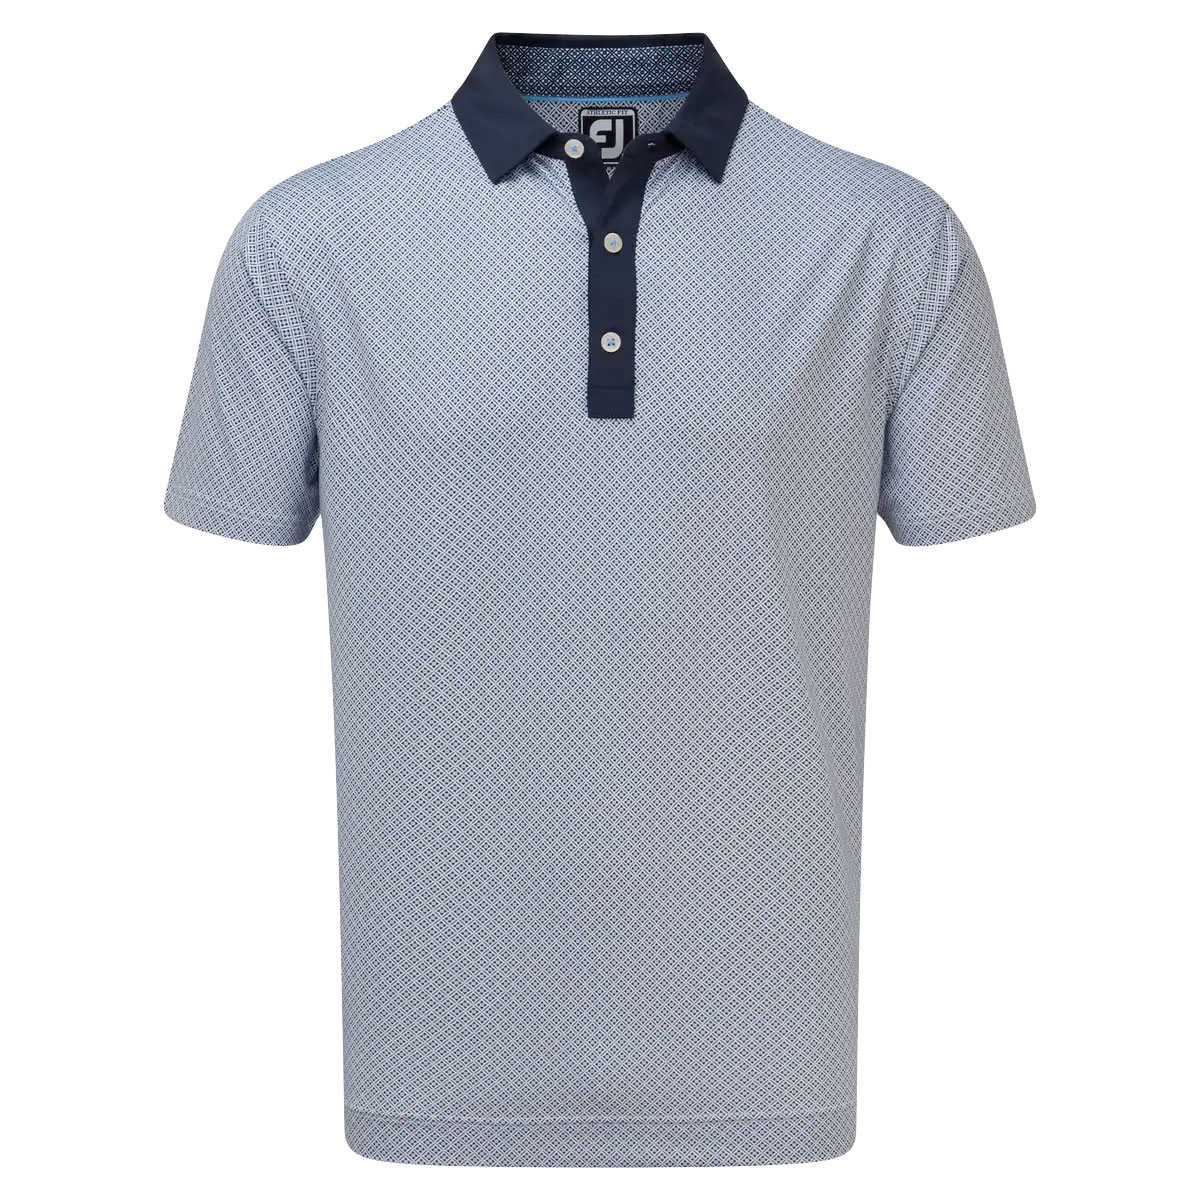 FootJoy Lisle Foulard Print Mens Golf Polo Shirt  - Navy/White